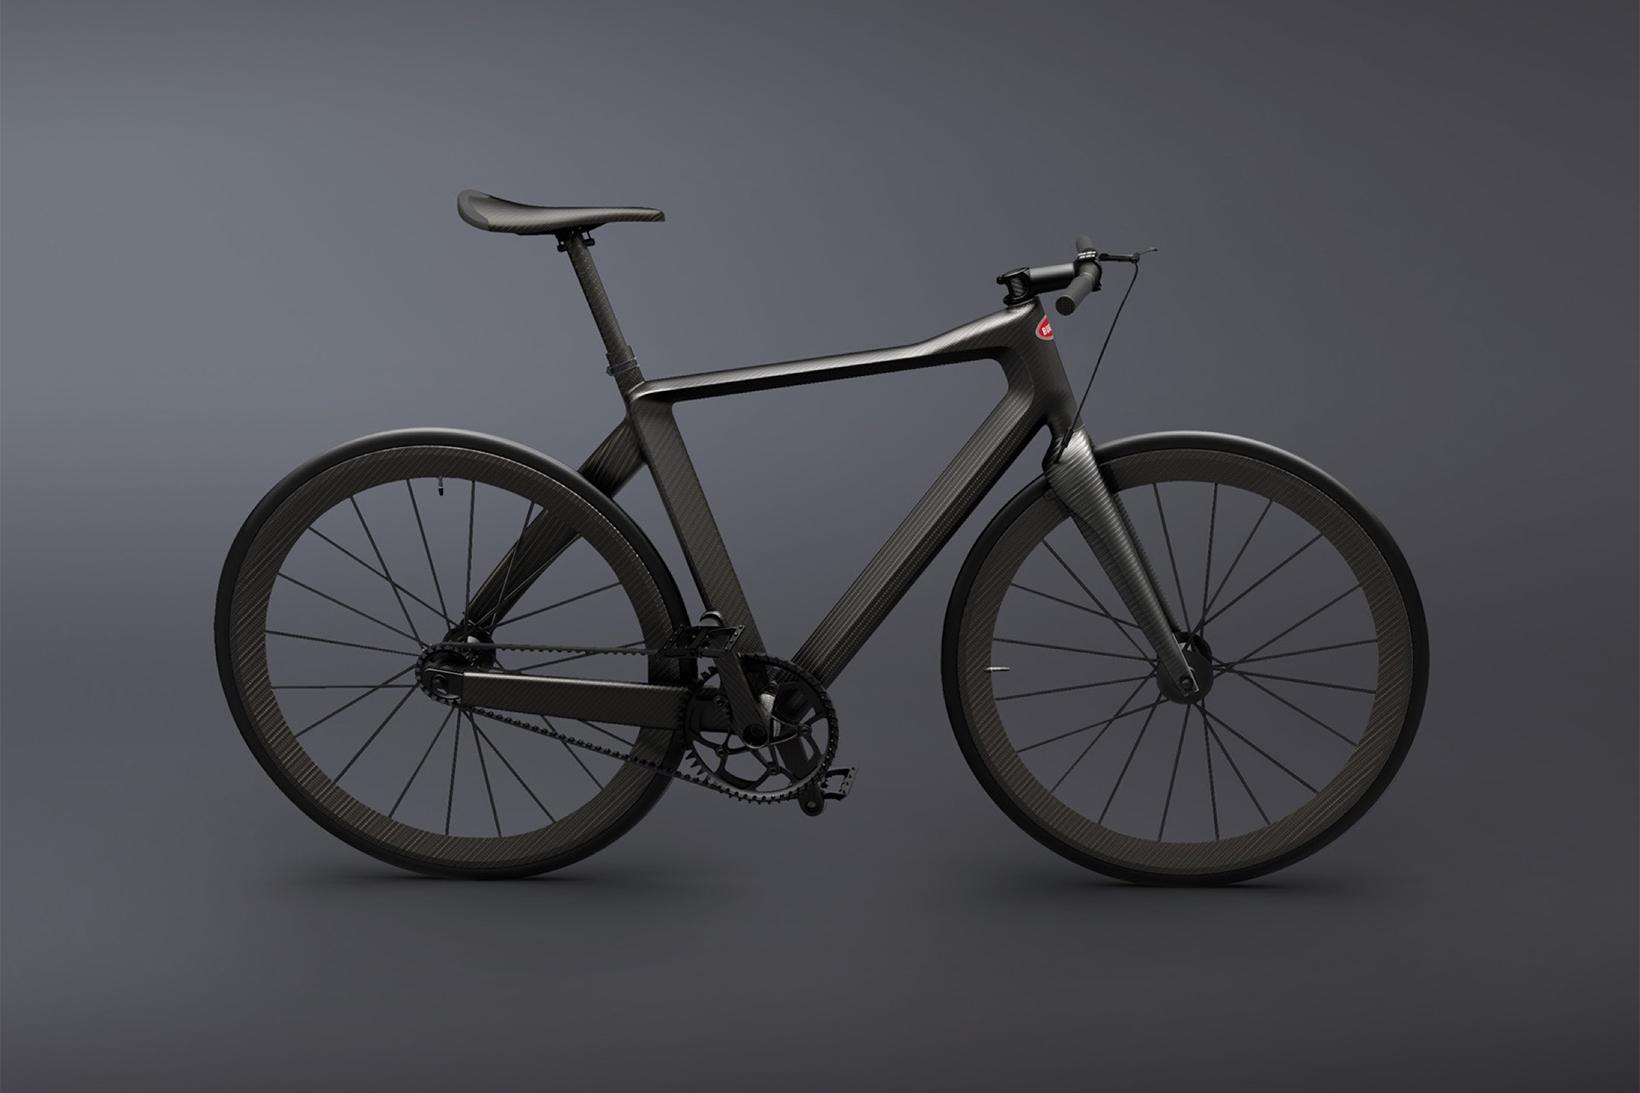 pg bugatti bike hypebeast. Black Bedroom Furniture Sets. Home Design Ideas